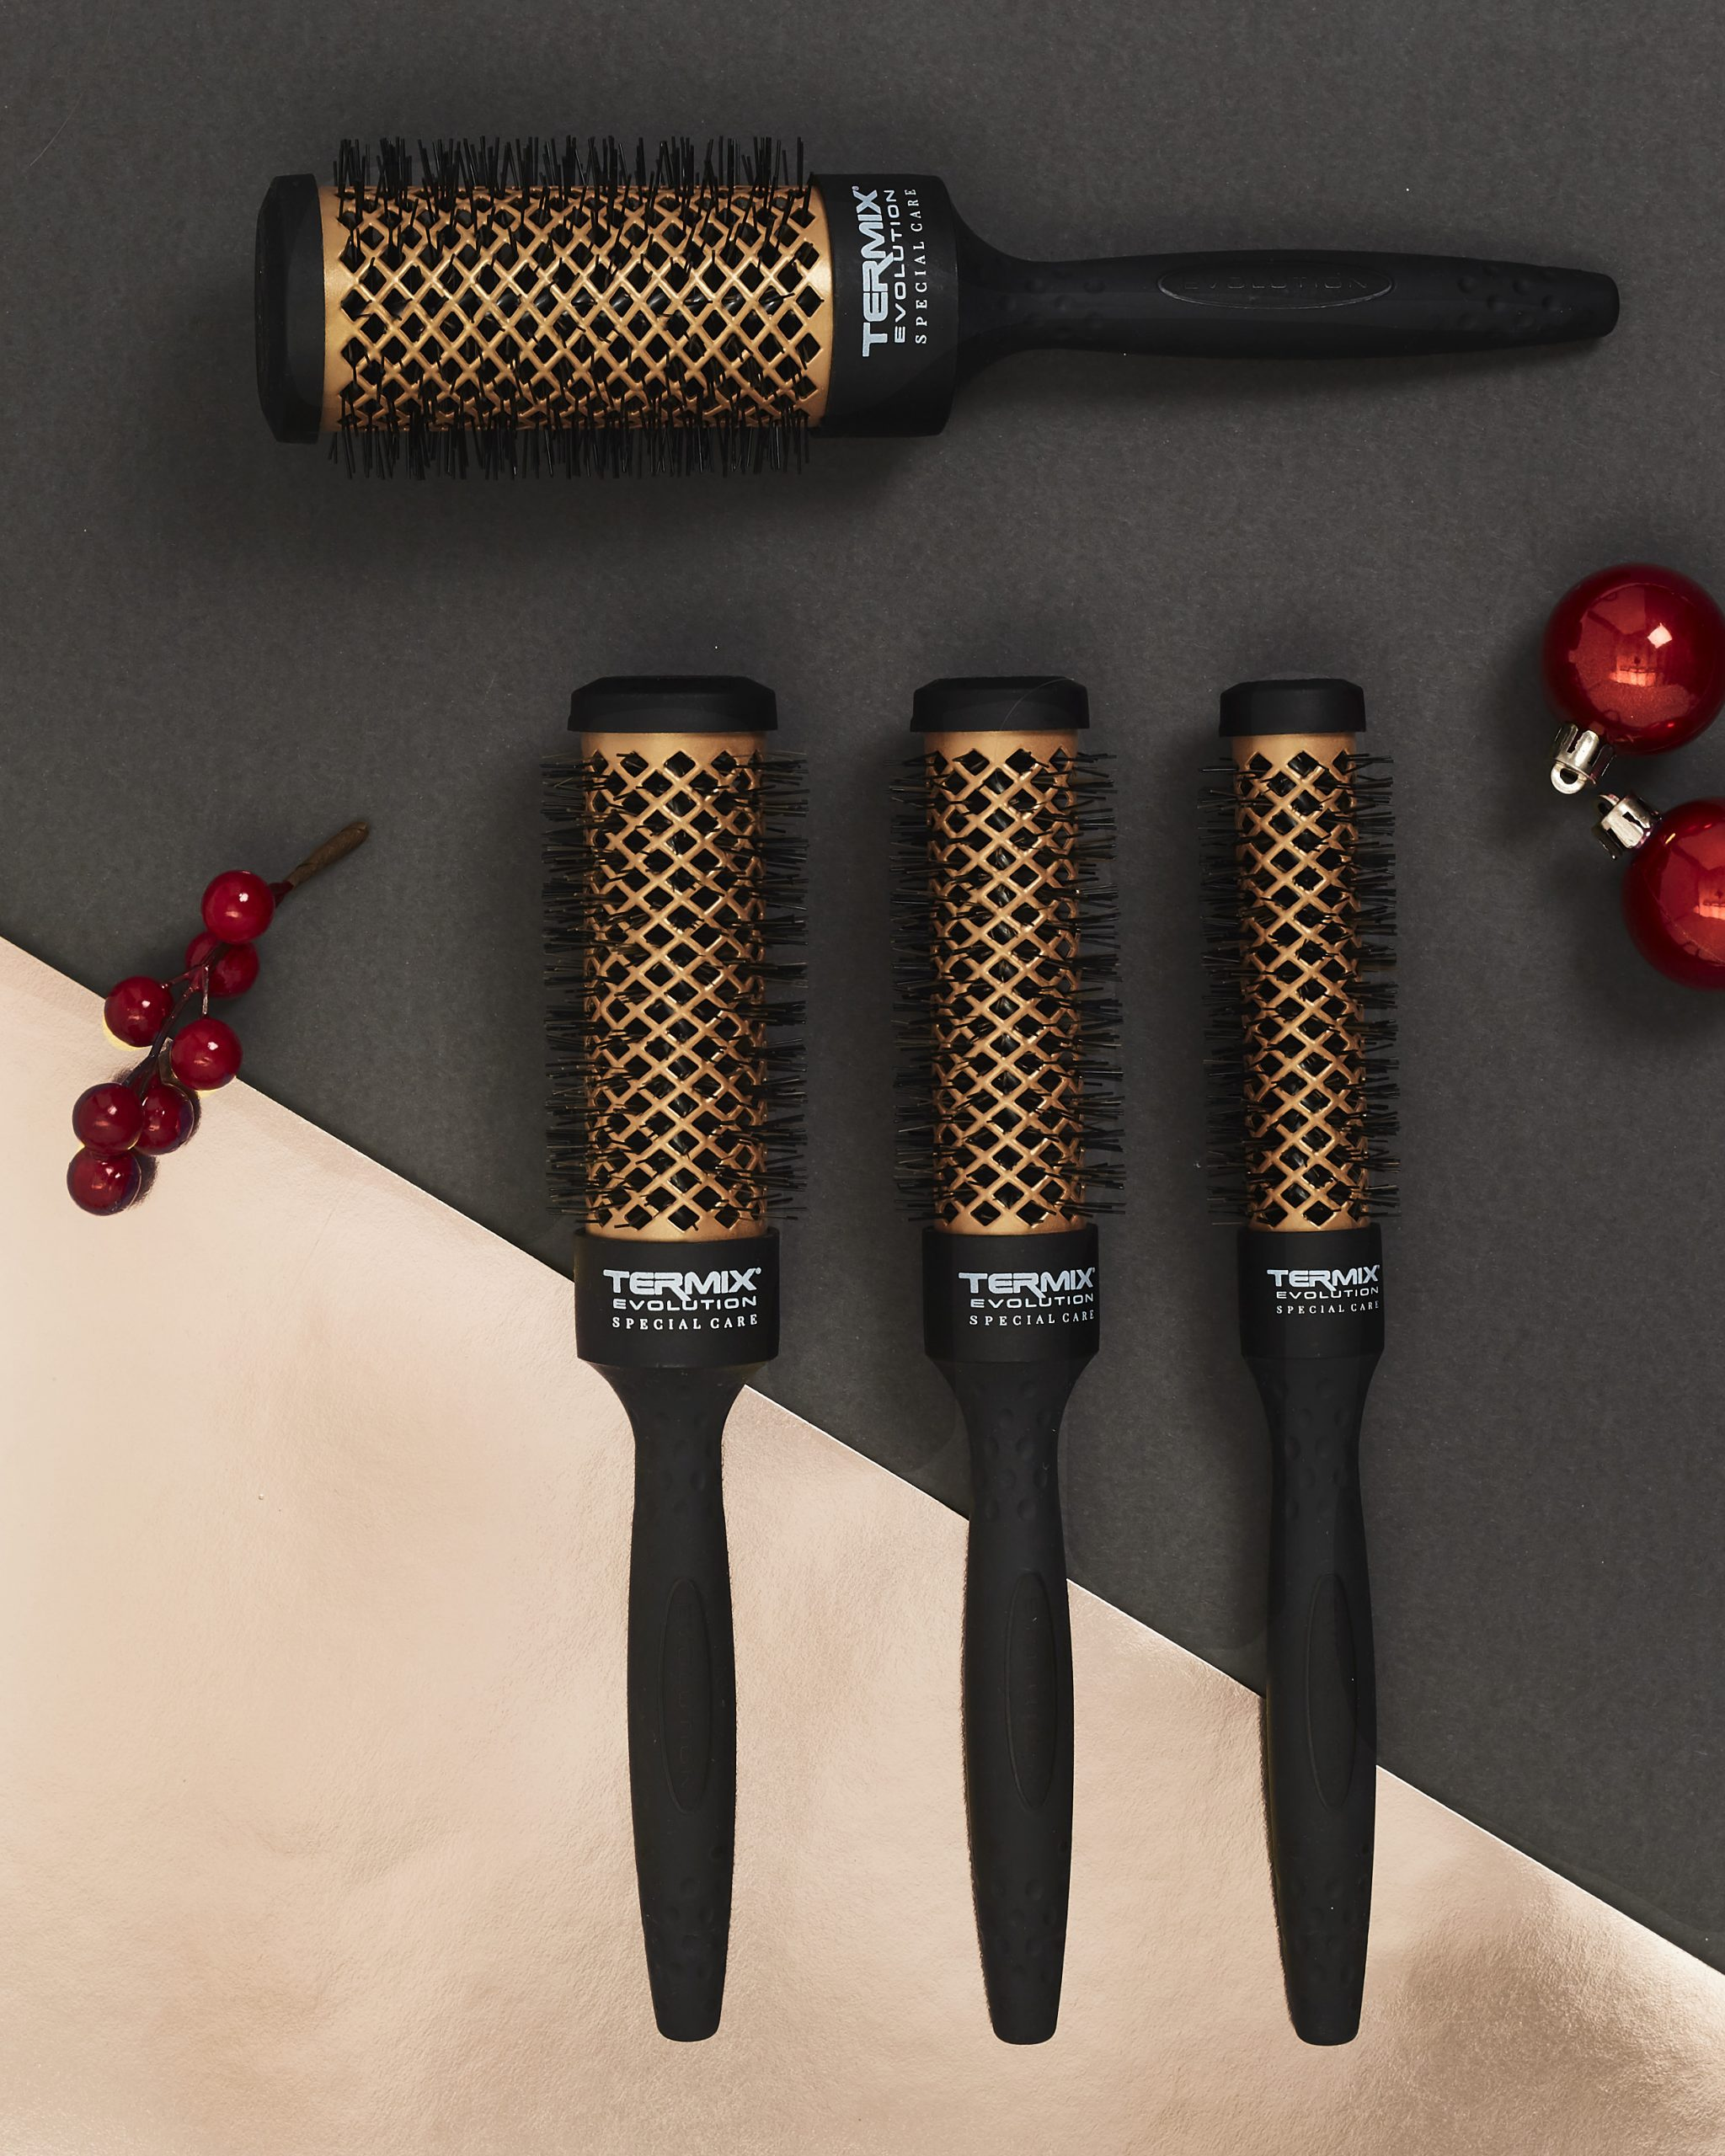 Cepillos Termix Evolution Special Care para cabellos dañados Navidad